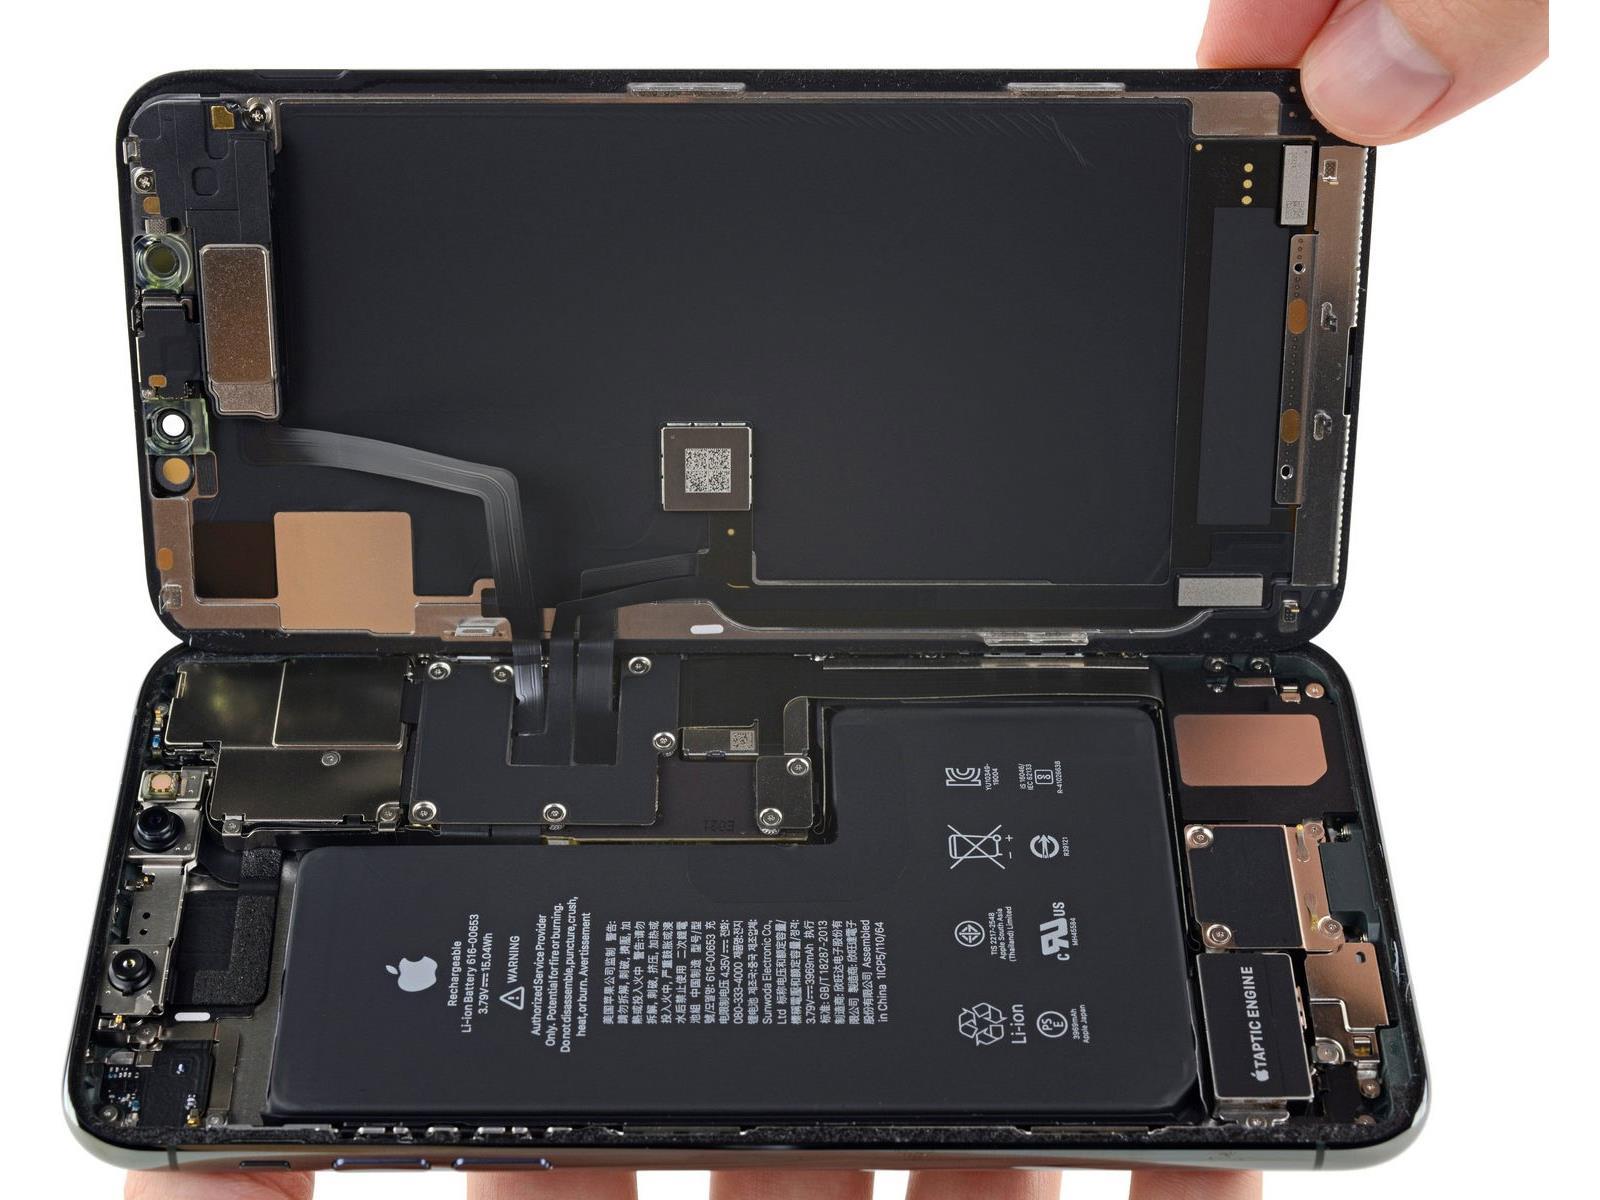 Iphone 11 Pro Max Teardown Revives Rumors Of 2 Way Wireless Charging Decent Repairability Hothardware